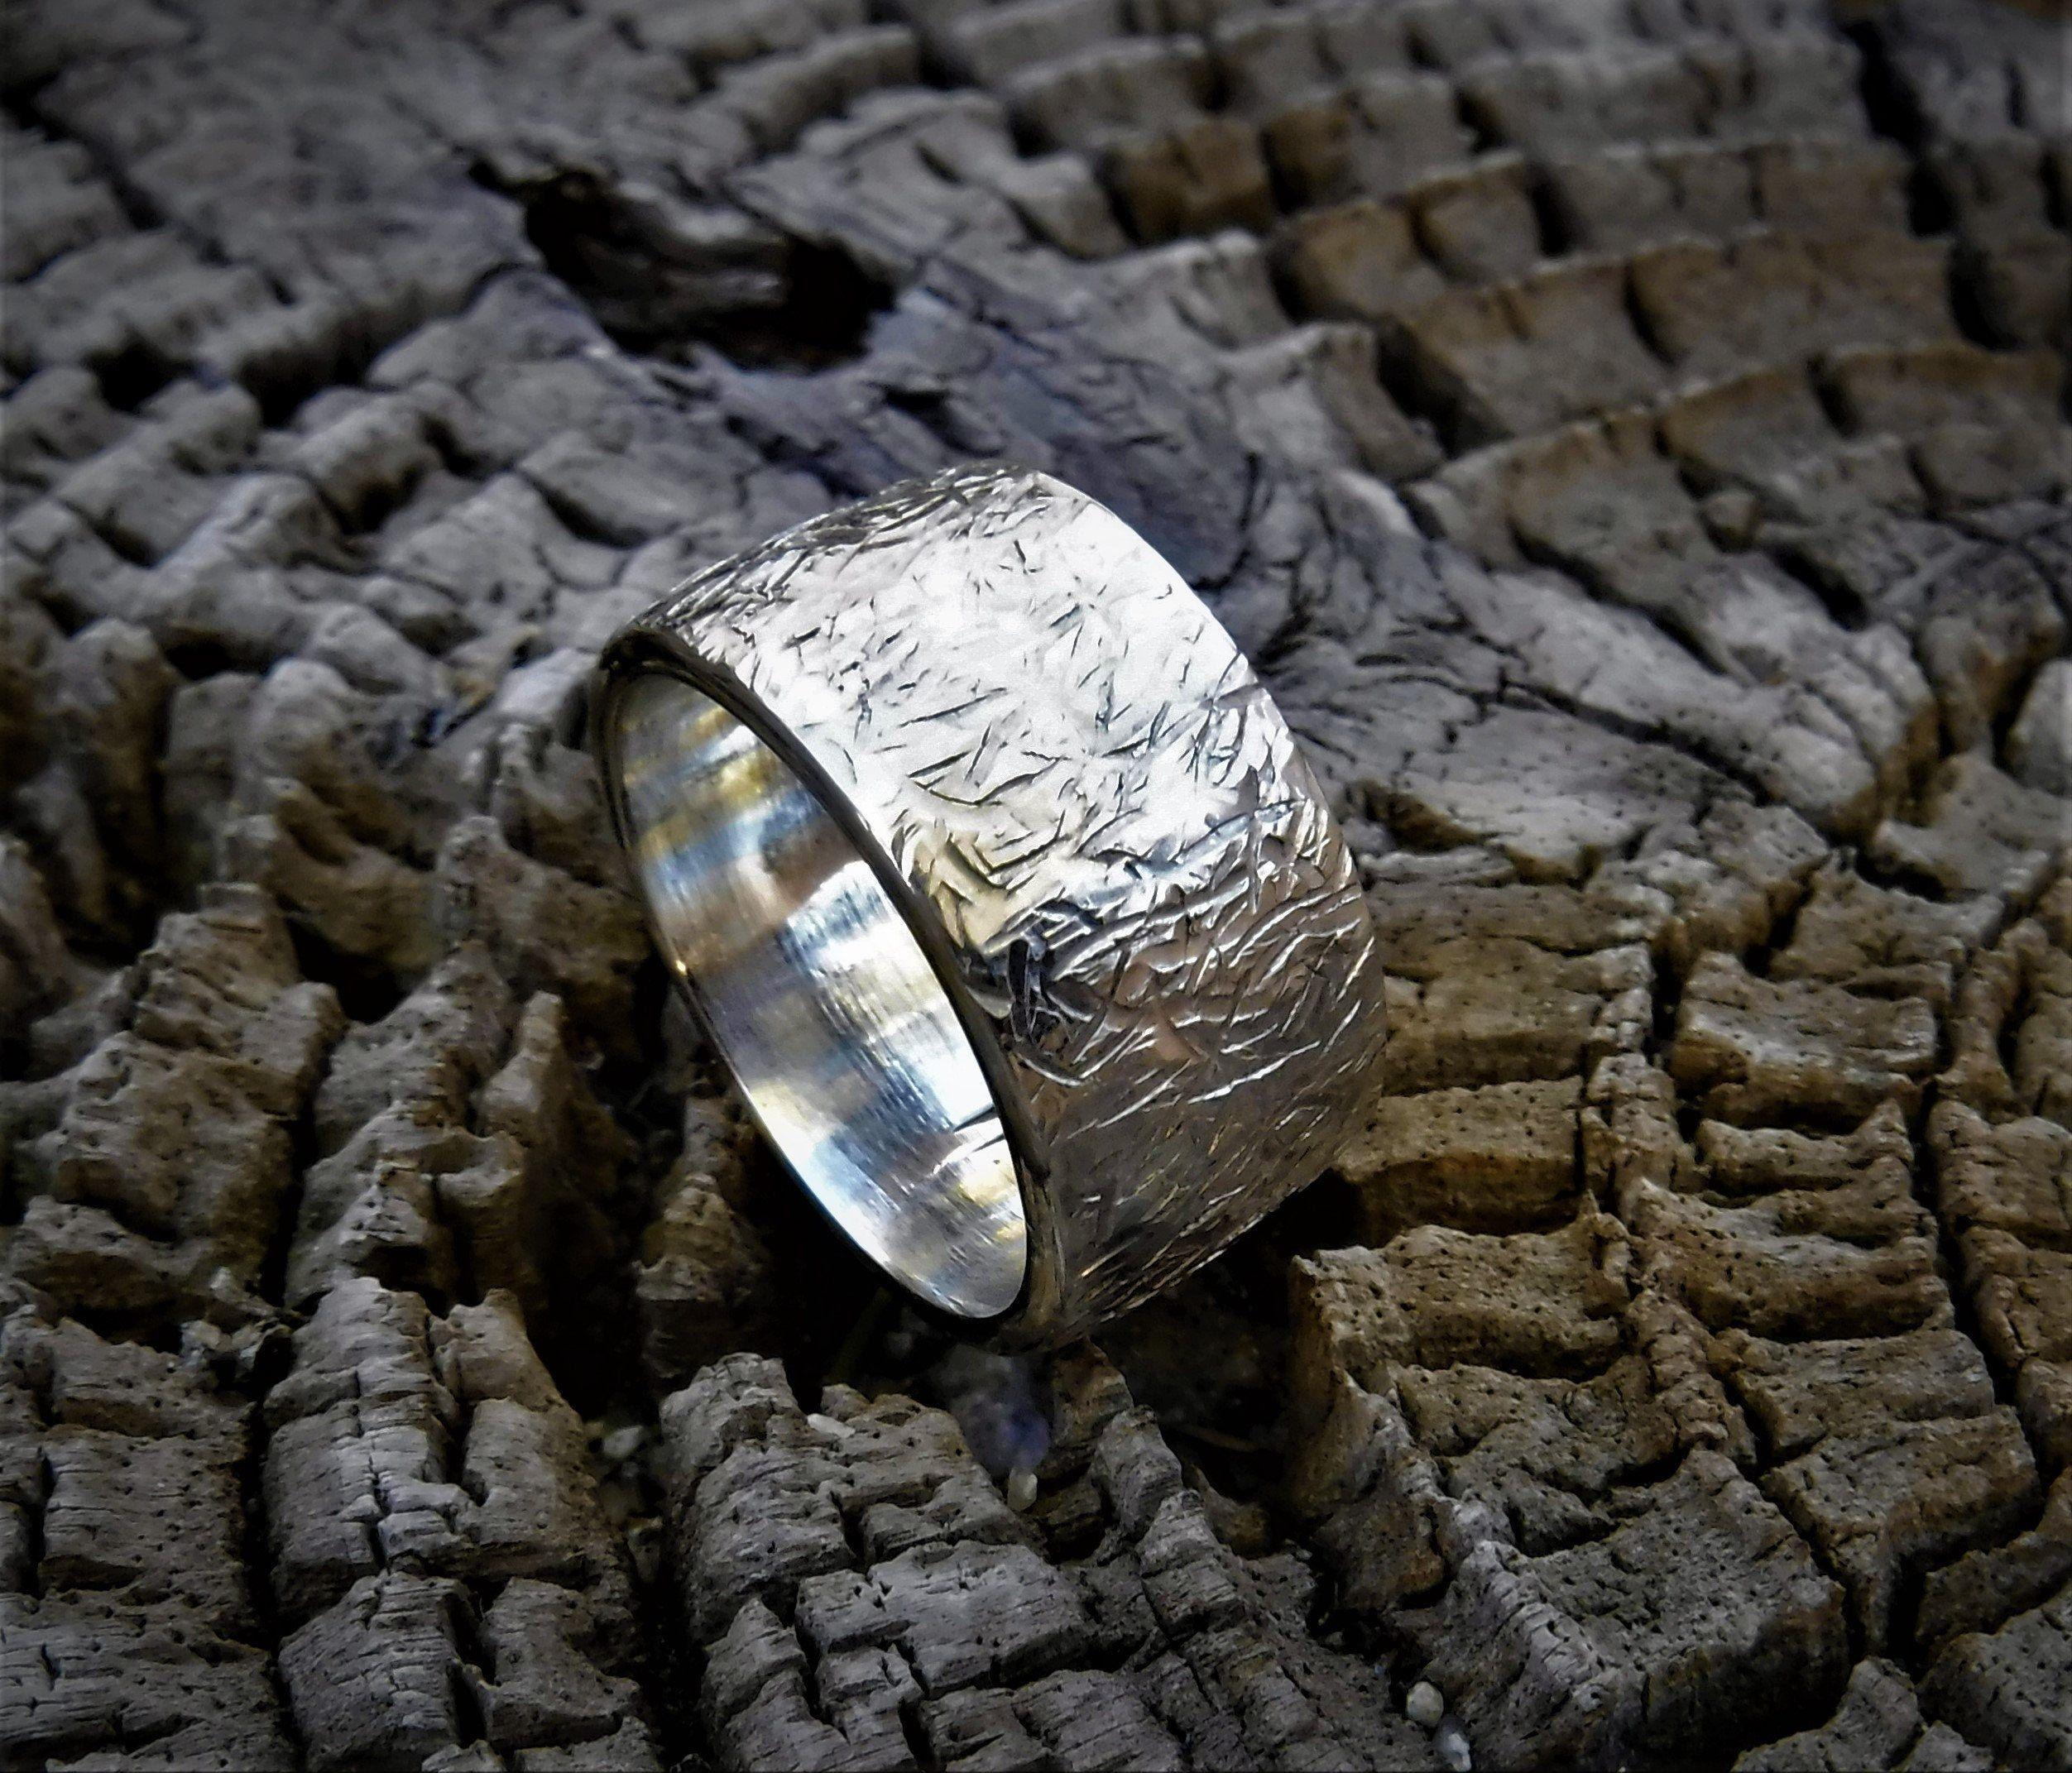 Viking Hammered 925 Sterling Silver Wedding Ring Size 11 Wide 12 5 Mm And Heav In 2020 Sterling Silver Wedding Rings Hammered Wedding Rings Tungsten Wedding Rings